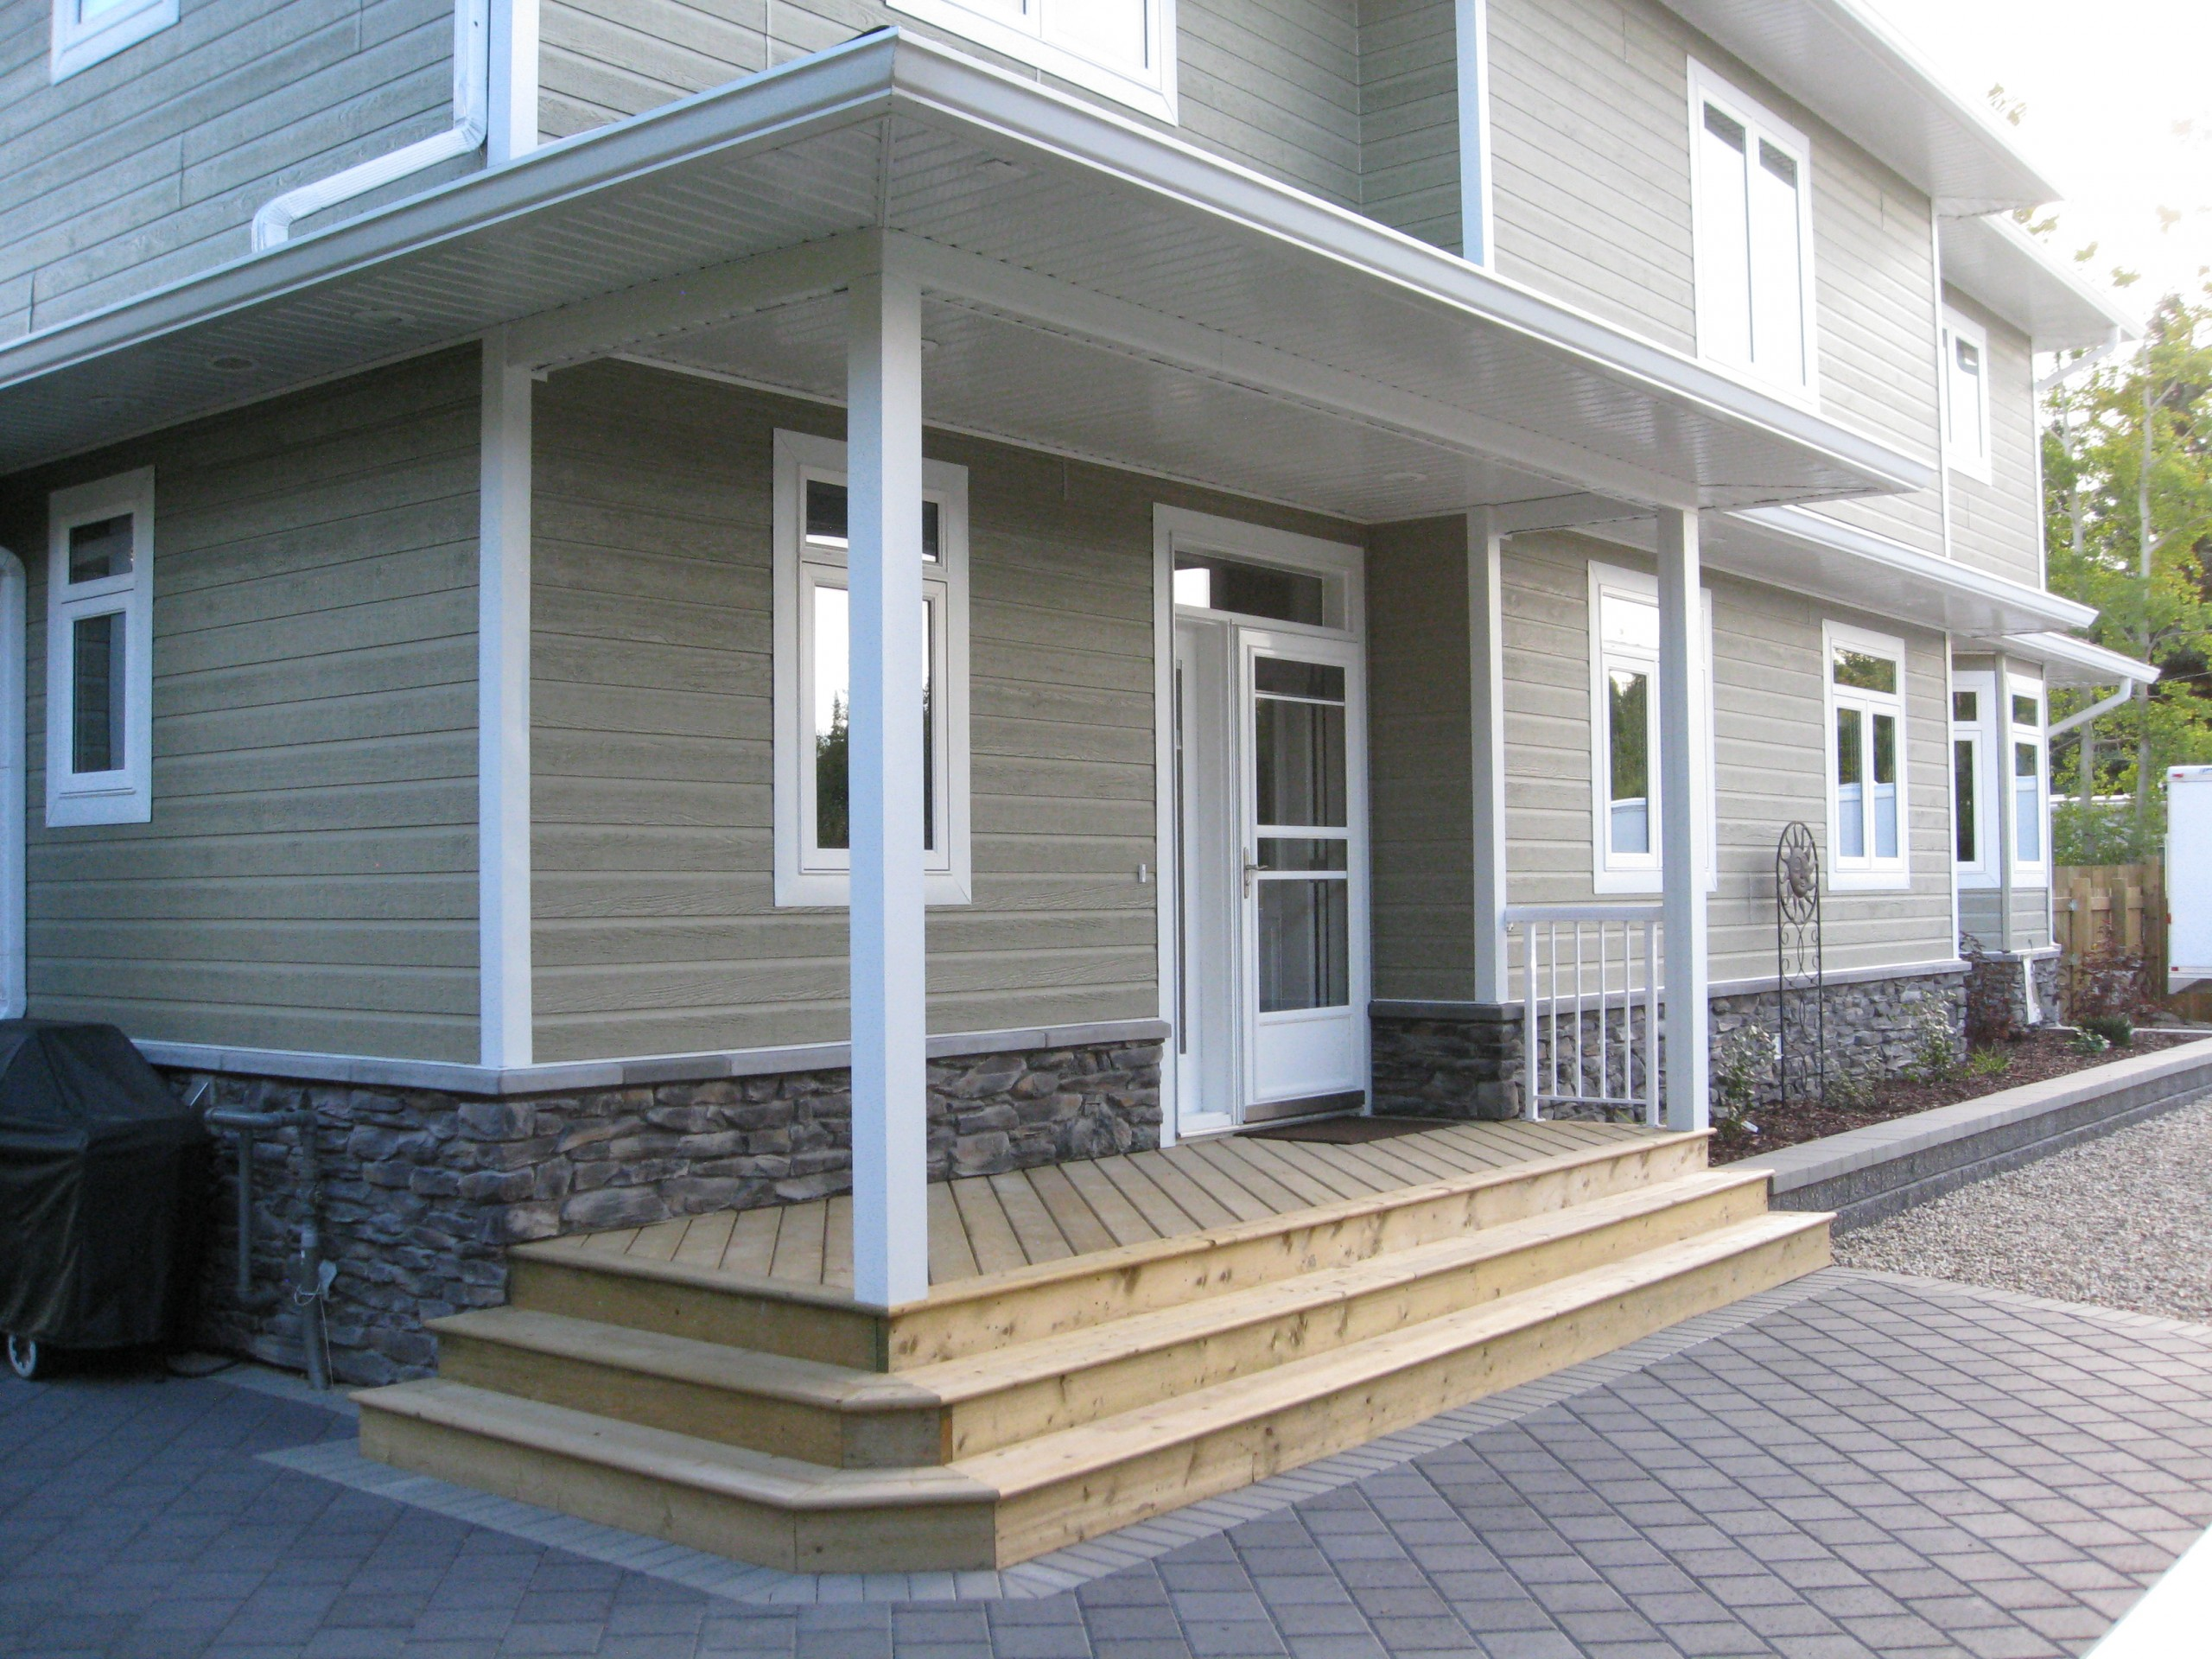 Exterior photo of wooden back porch showing dark stone cladding, medium grey siding and white trim.